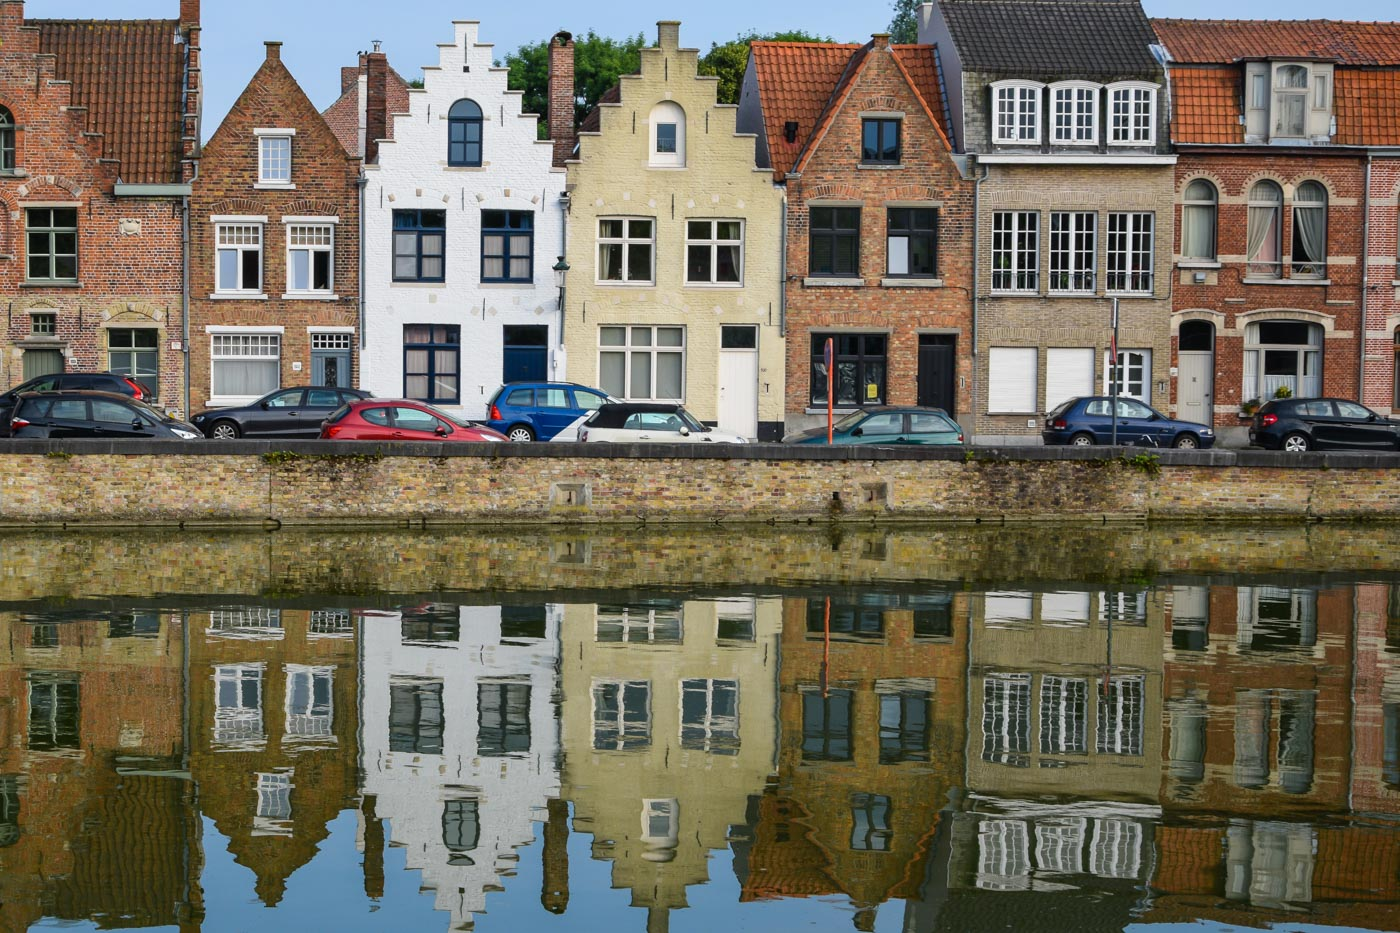 Велопутешествие по Европе. Нидерланды, Бельгия - Мидделбург, Брюгге